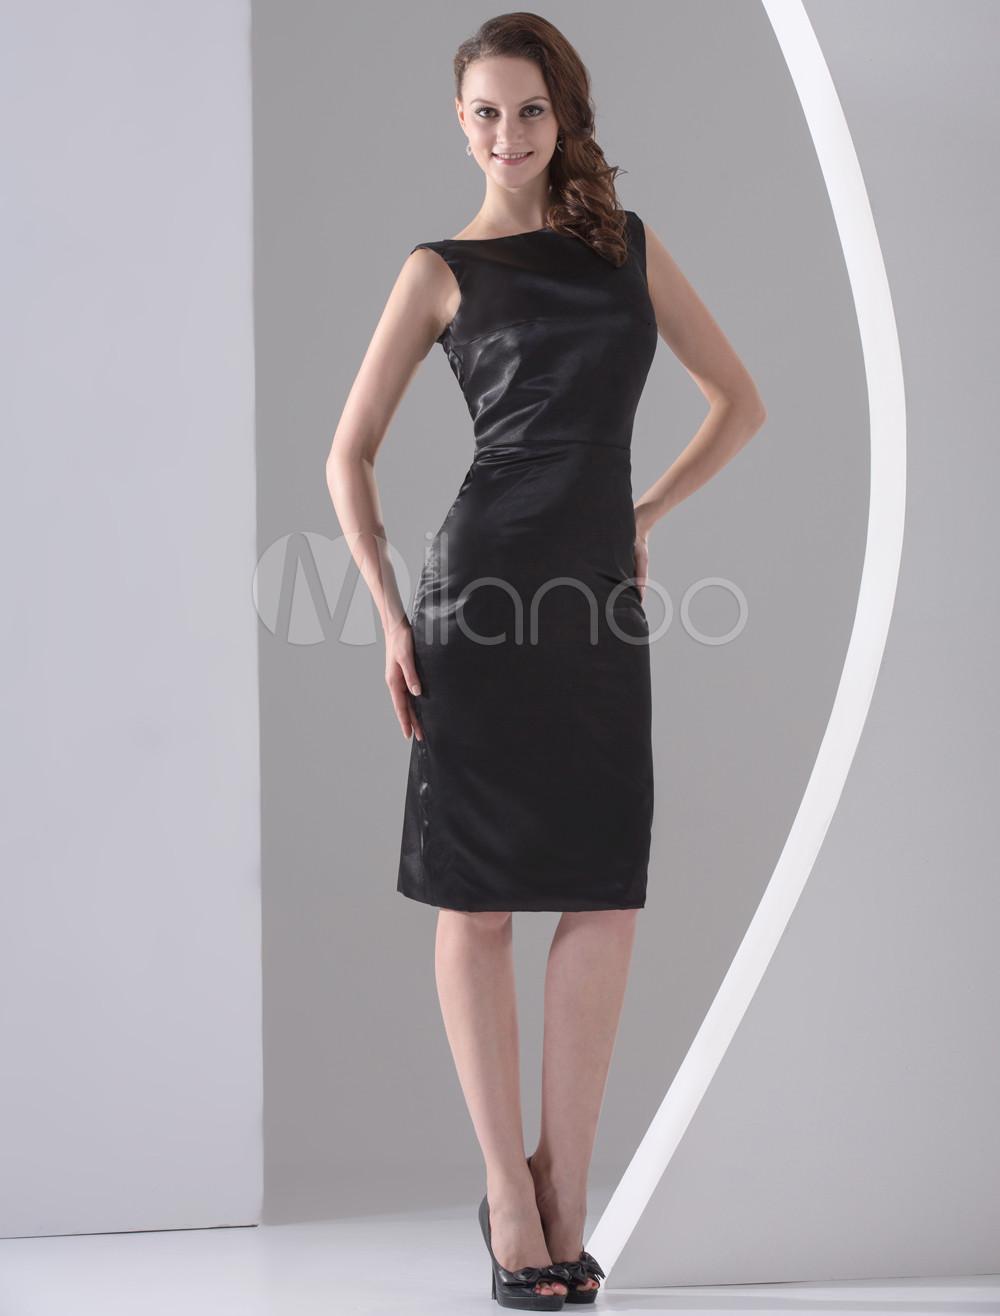 Vintage Black Silk-Like Cocktail Dress (Wedding Cheap Party Dress) photo